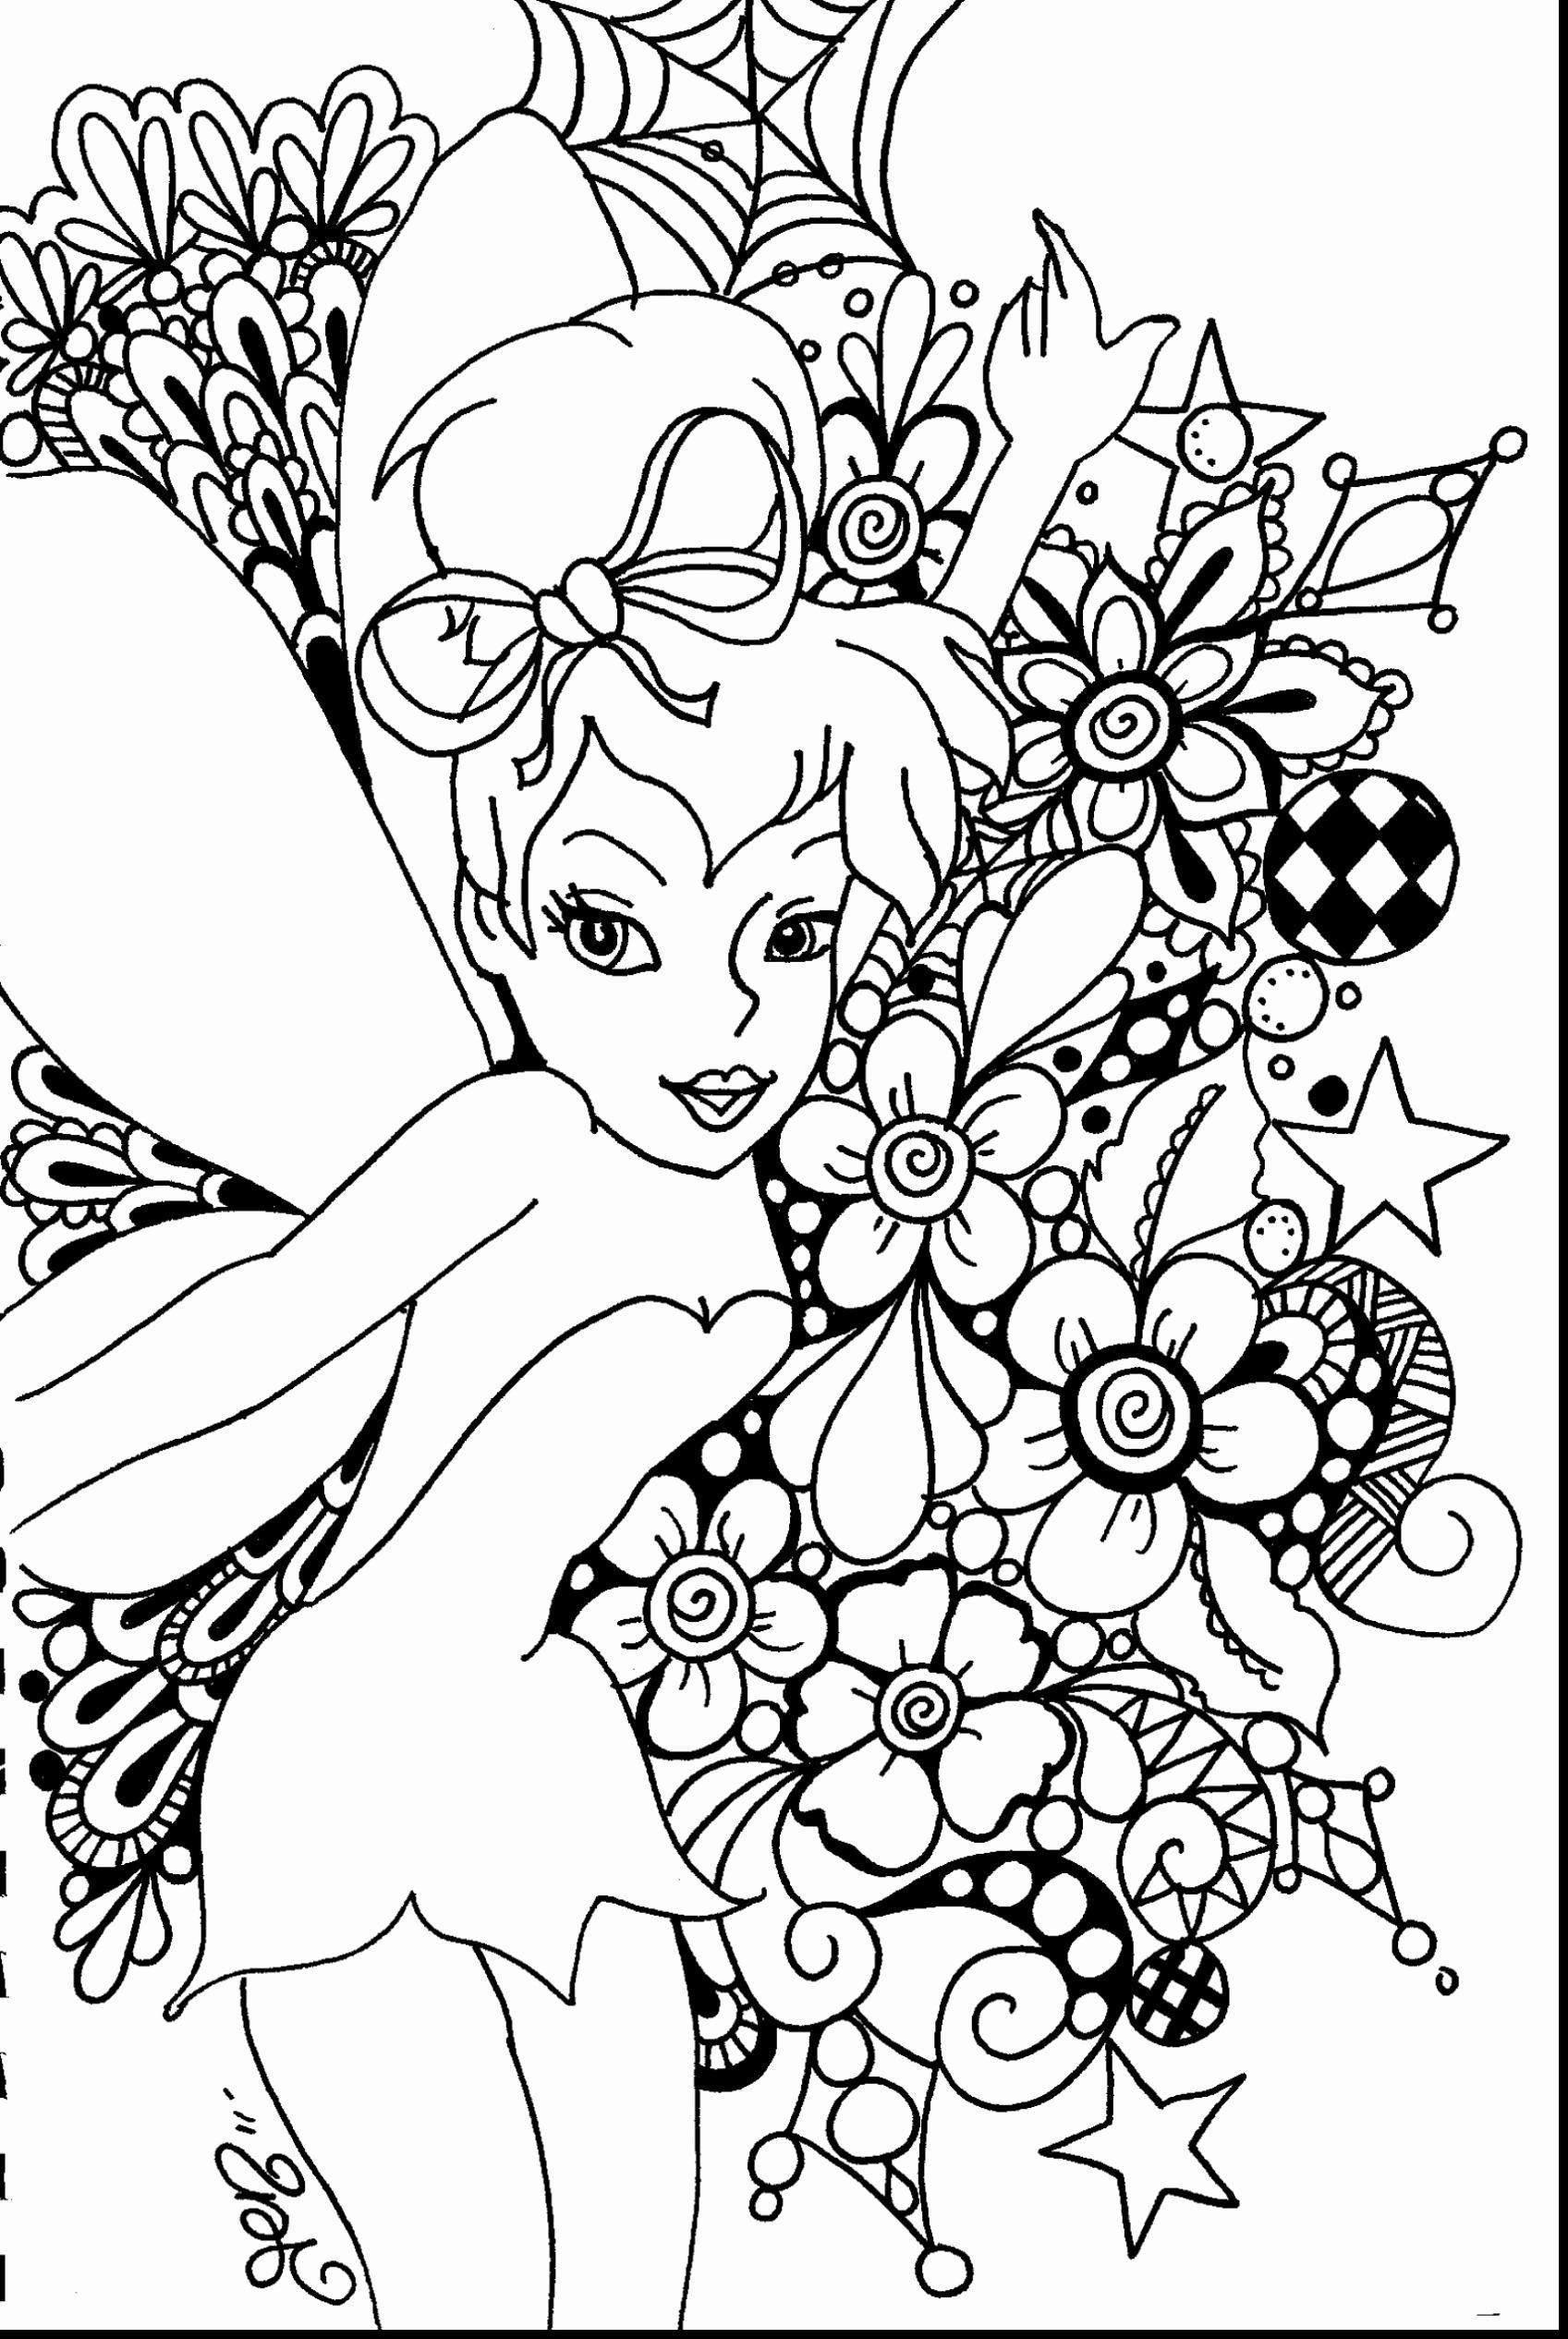 Disney Coloring Pages For Adults Unique Disney Coloring Pages For Adults Line In 2020 Tinkerbell Coloring Pages Fairy Coloring Pages Fairy Coloring